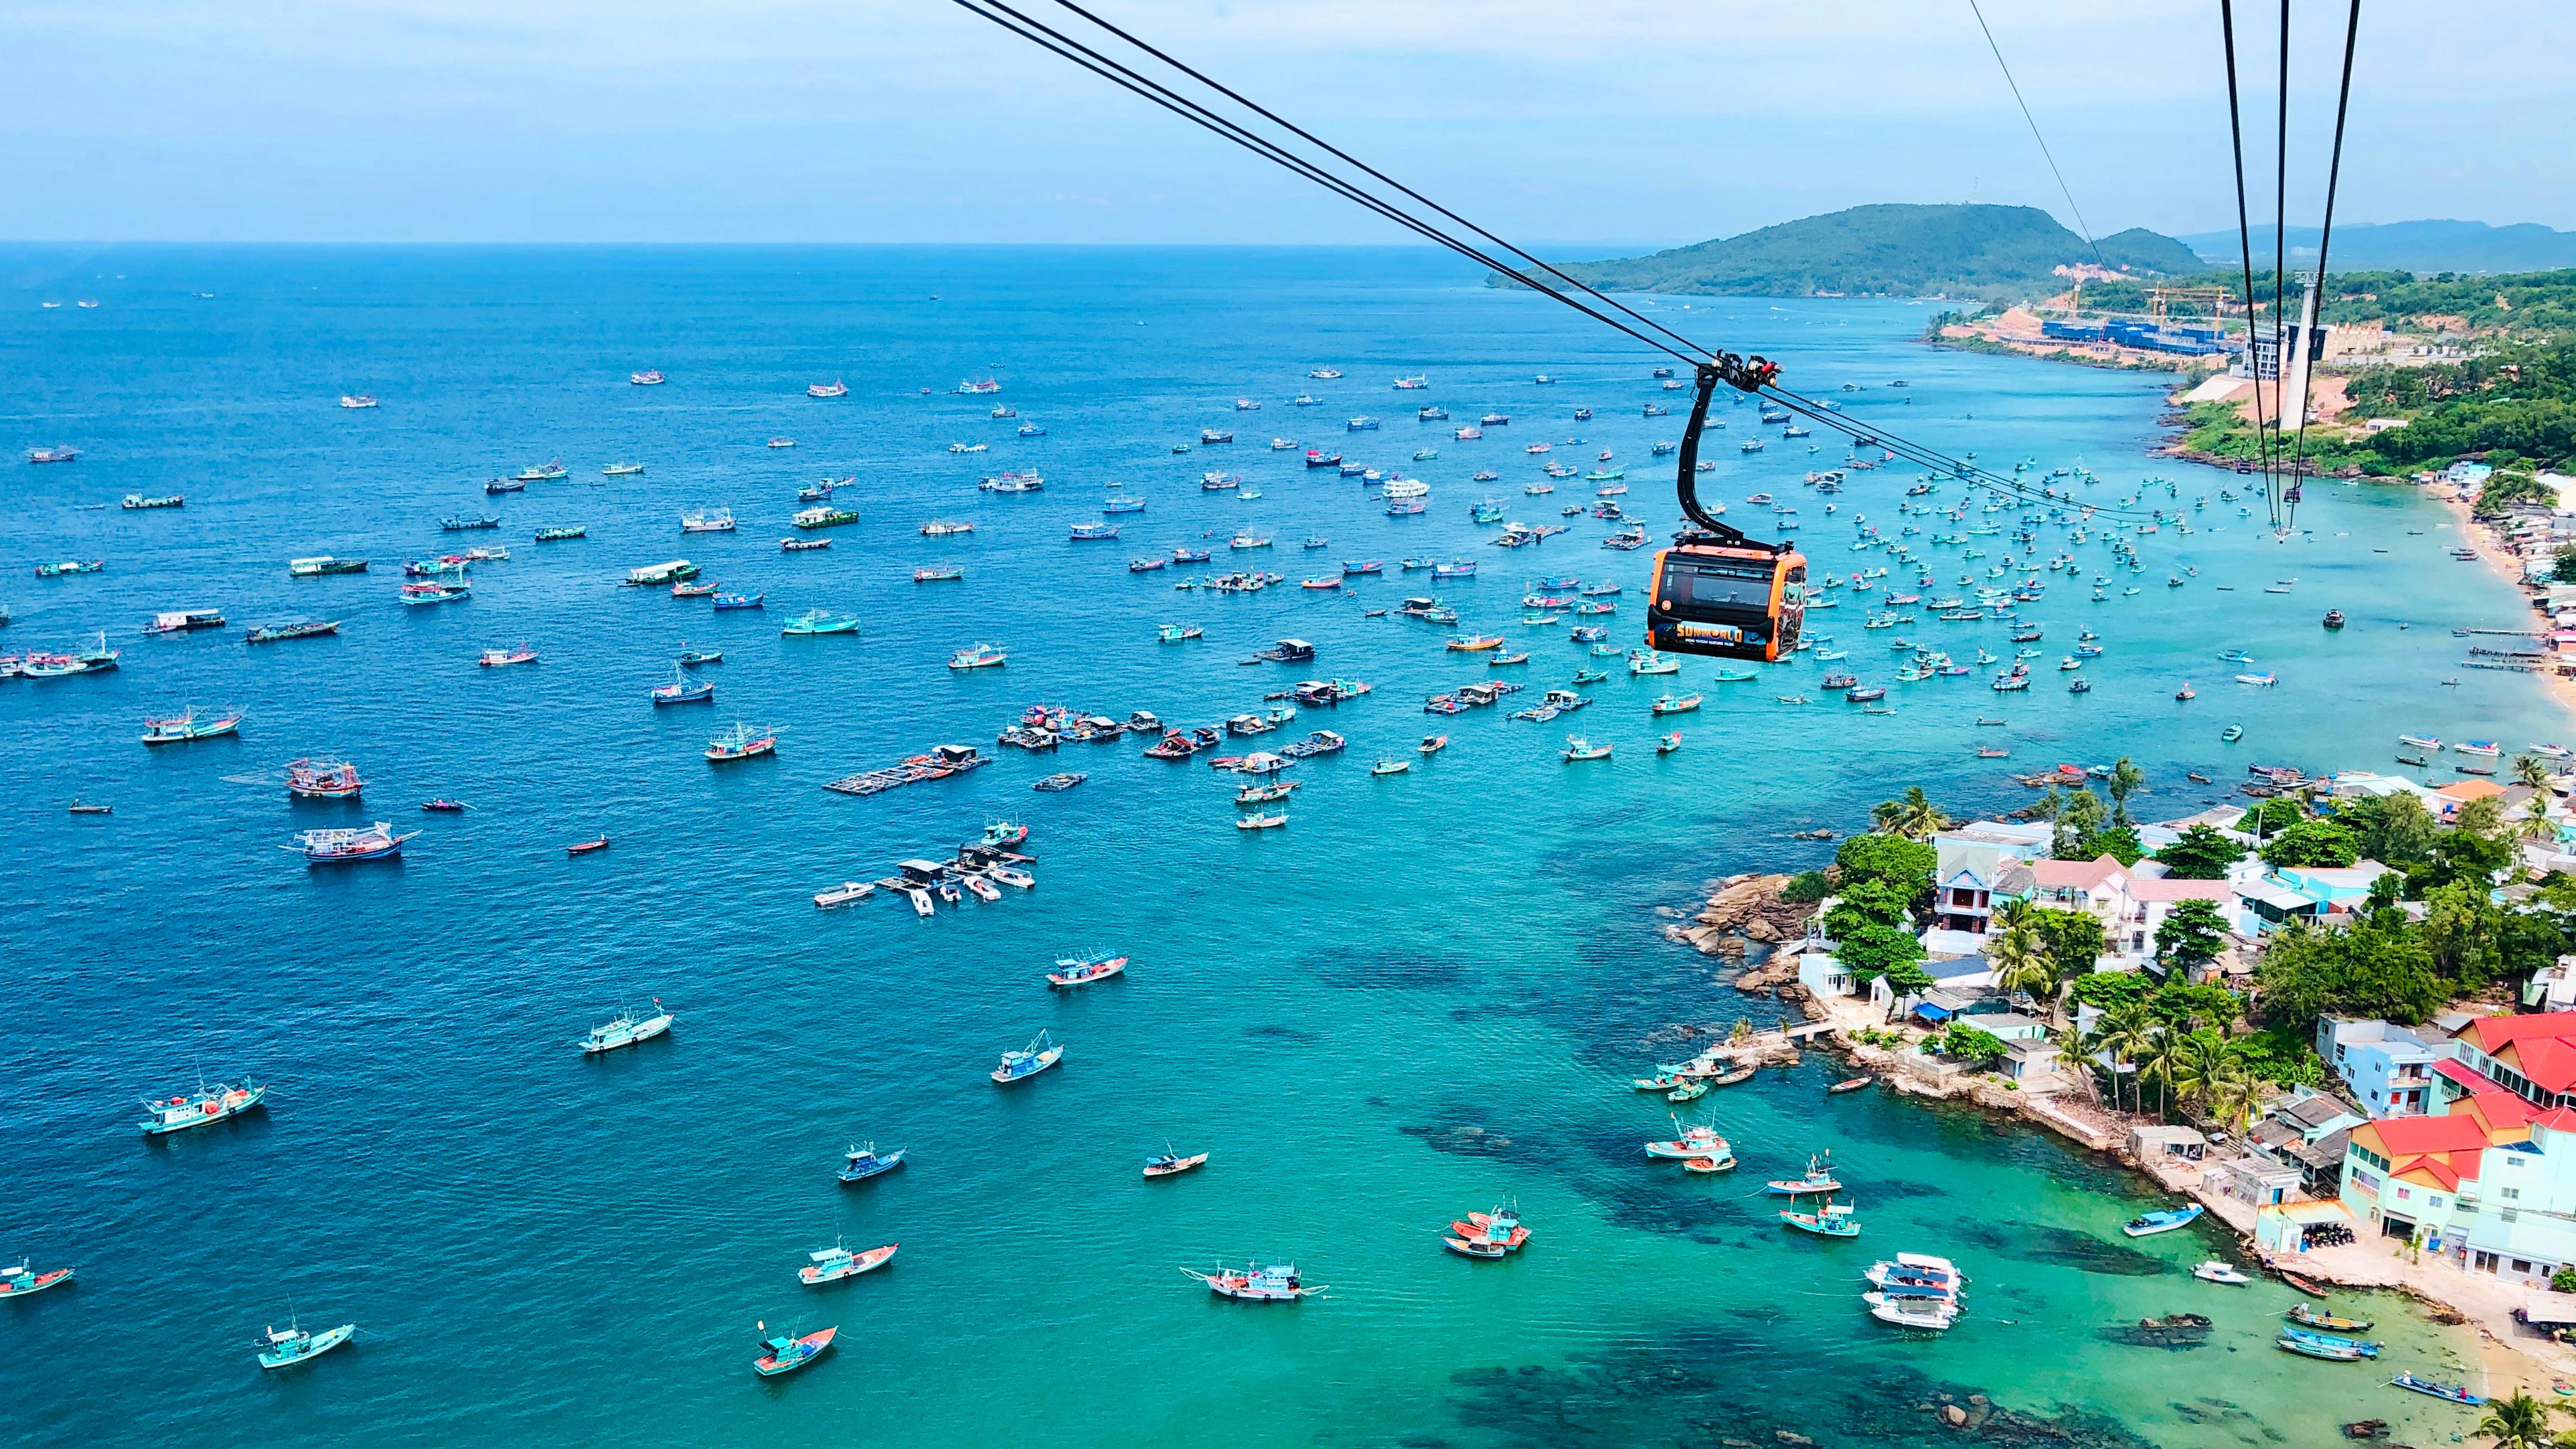 Phu Quoc: Best things to do in Vietnam's top island getaway